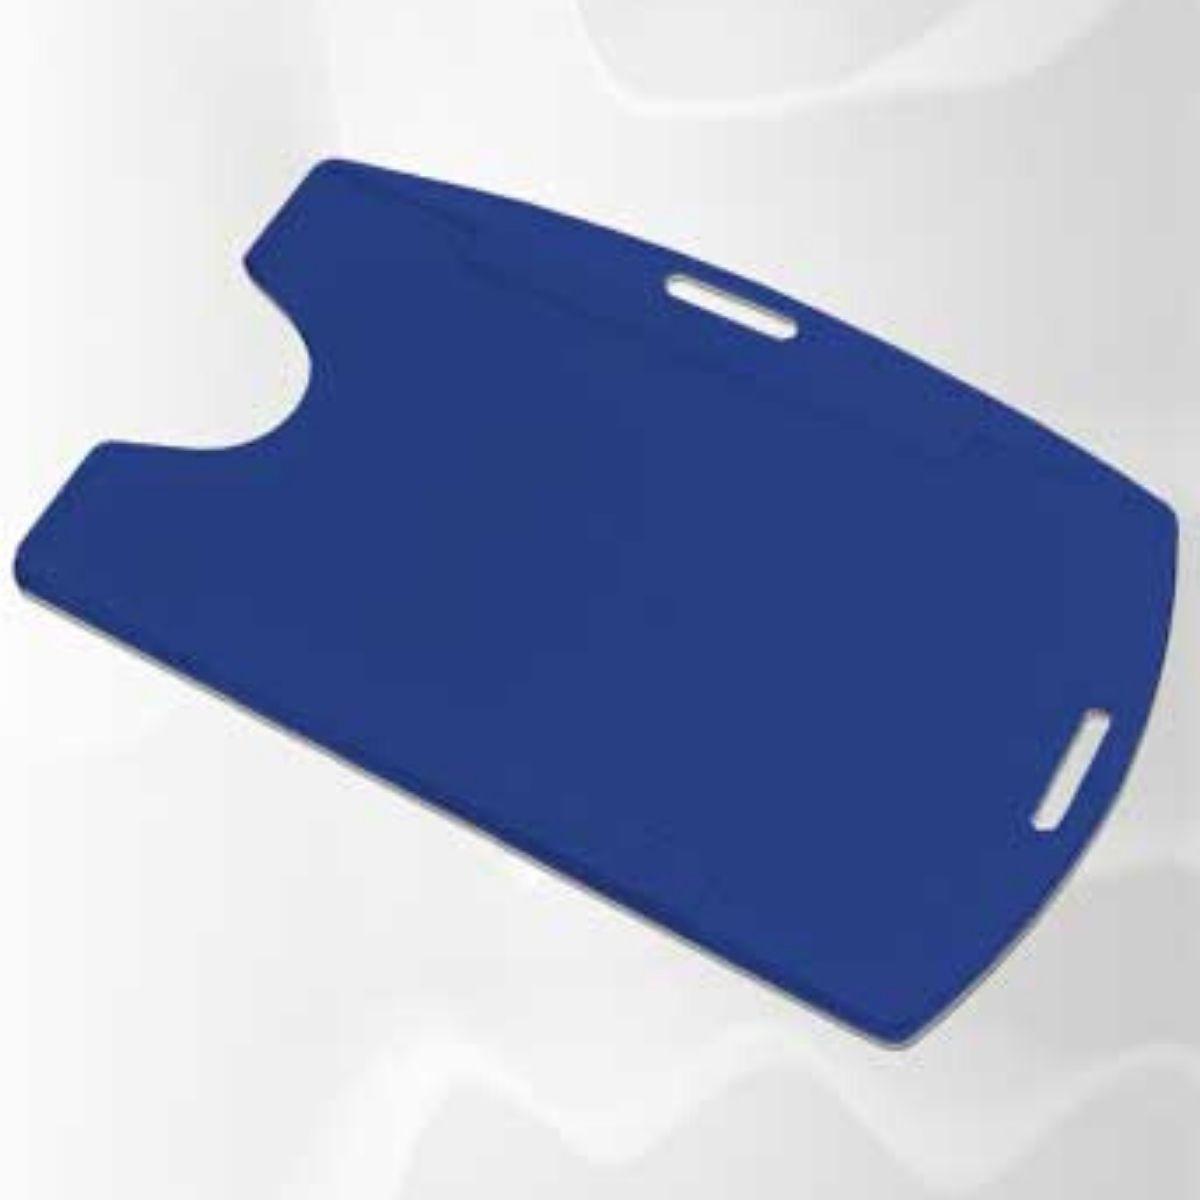 Kit 500 Protetores Porta Crachá Rígido M3 Conjugado Azul Royal  - Click Suprimentos